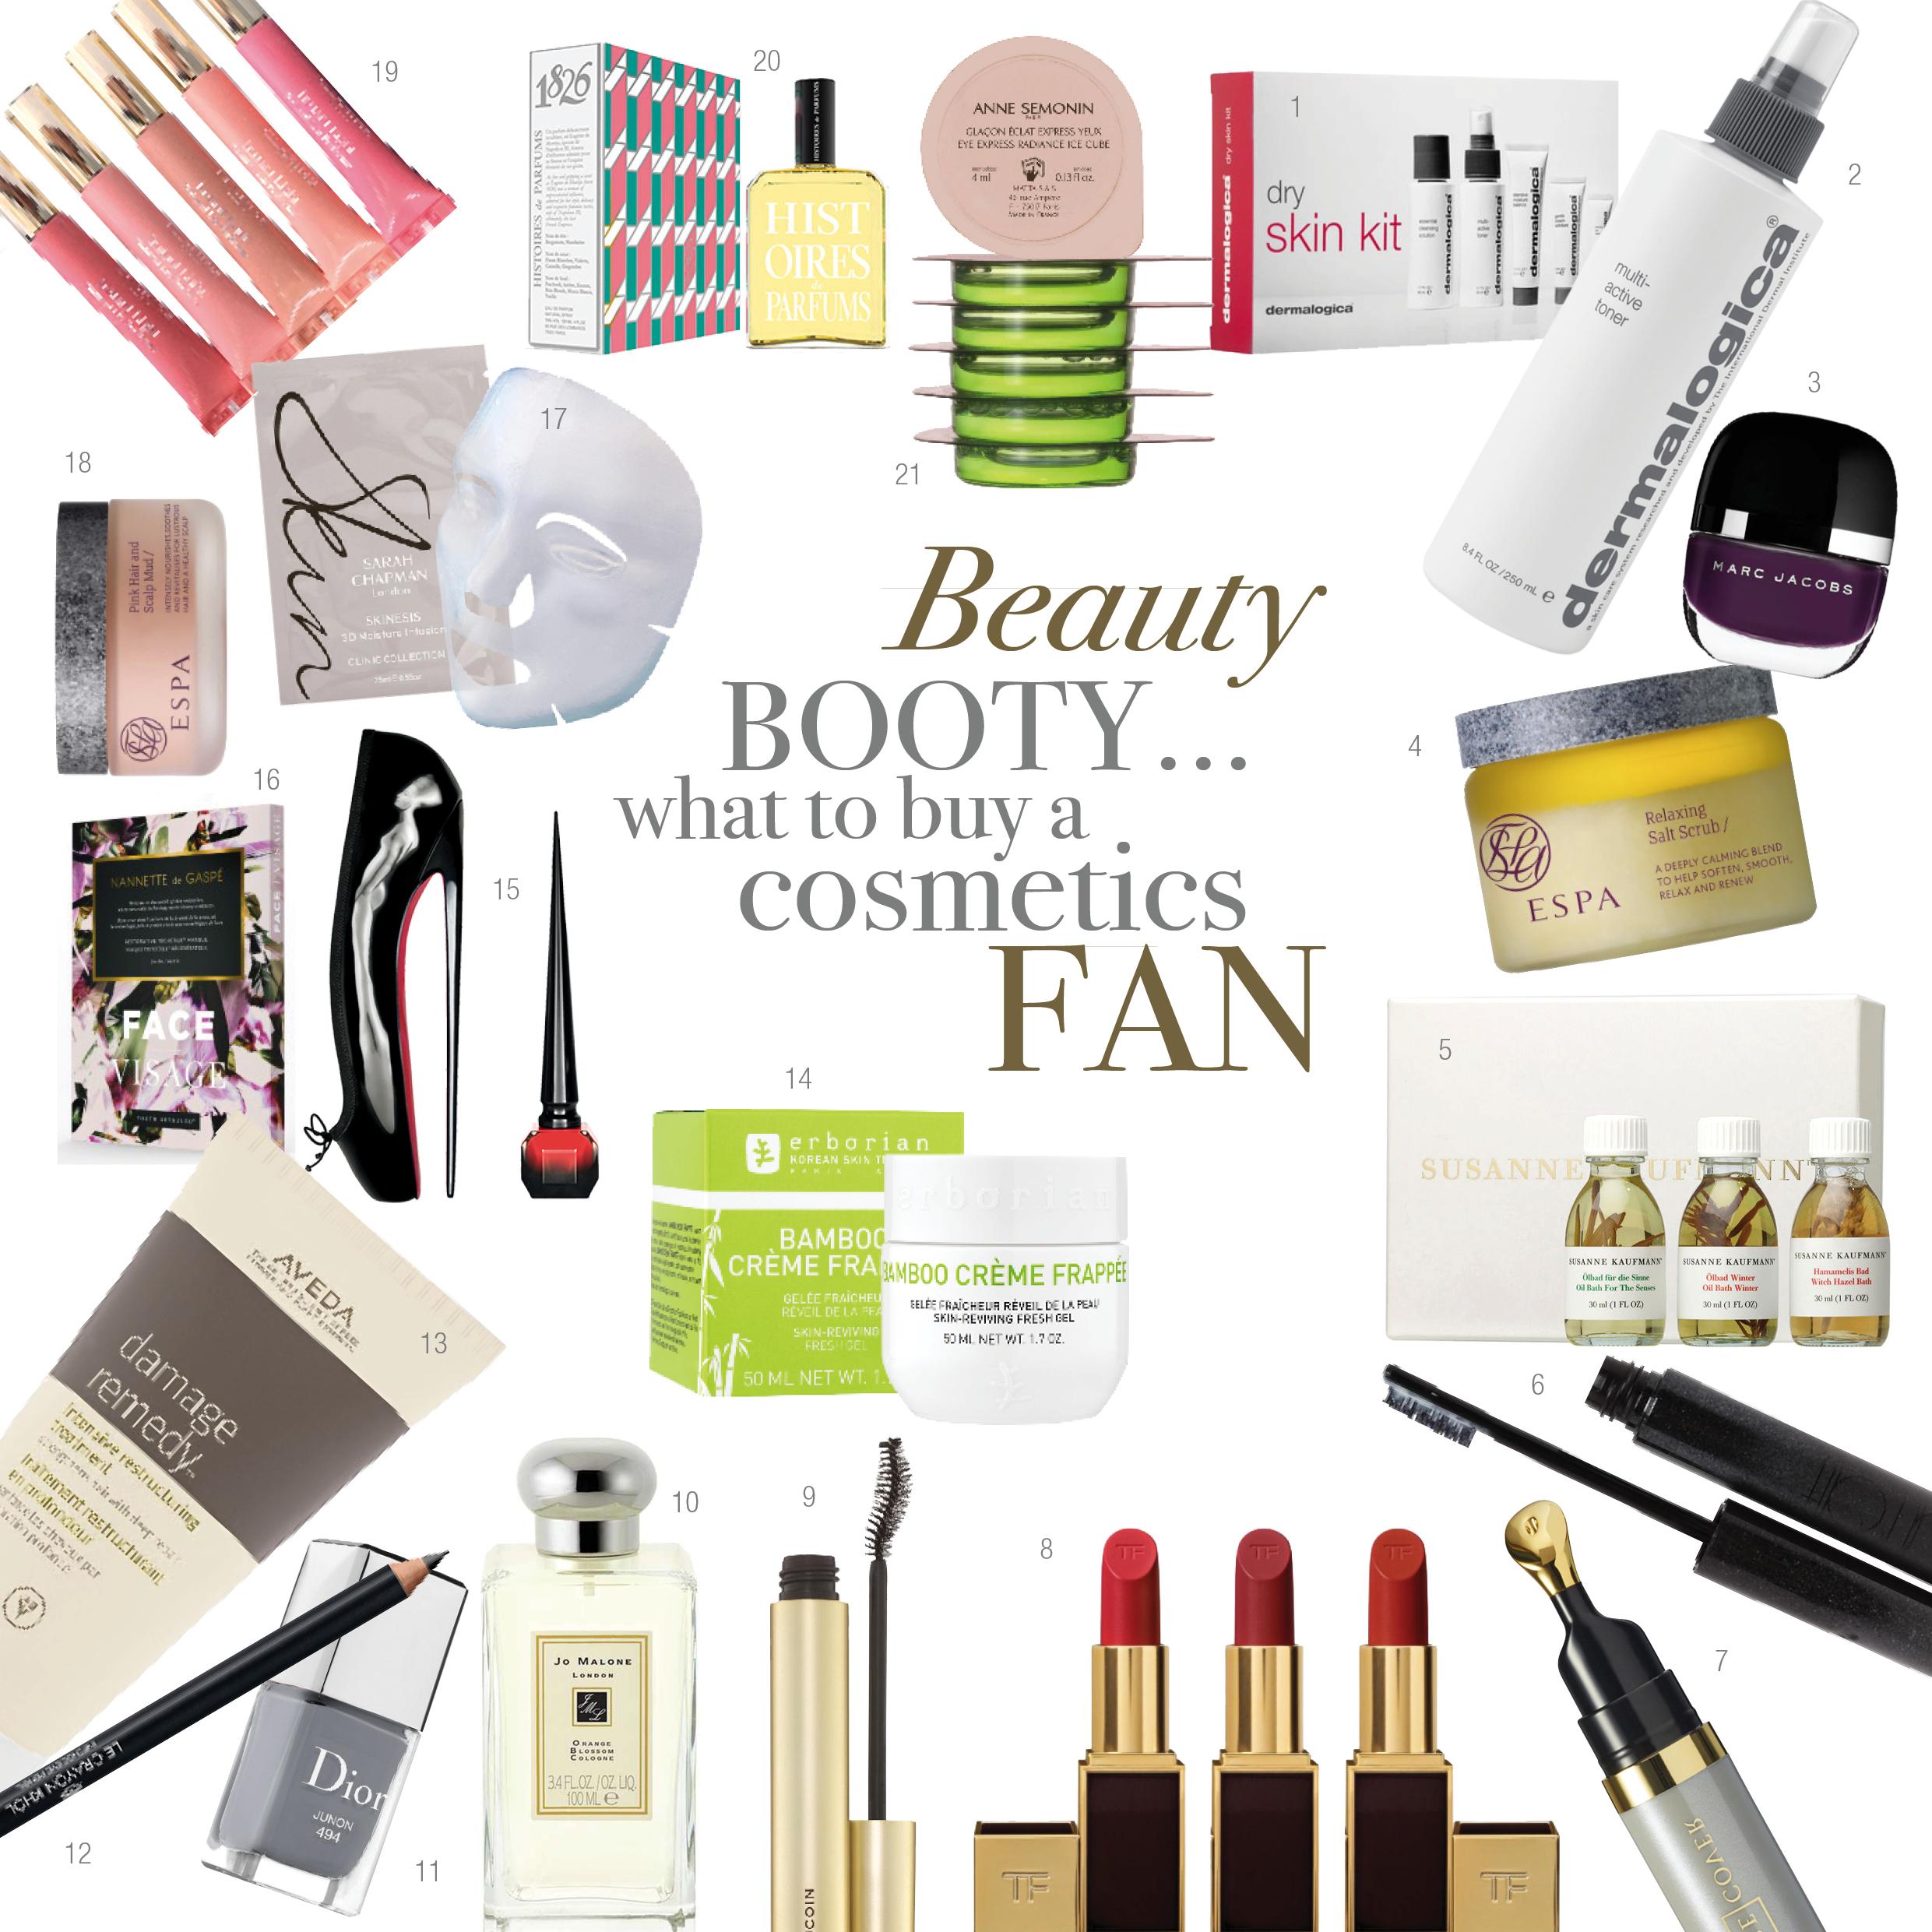 Beauty booty - What to buy a cosmetics fan